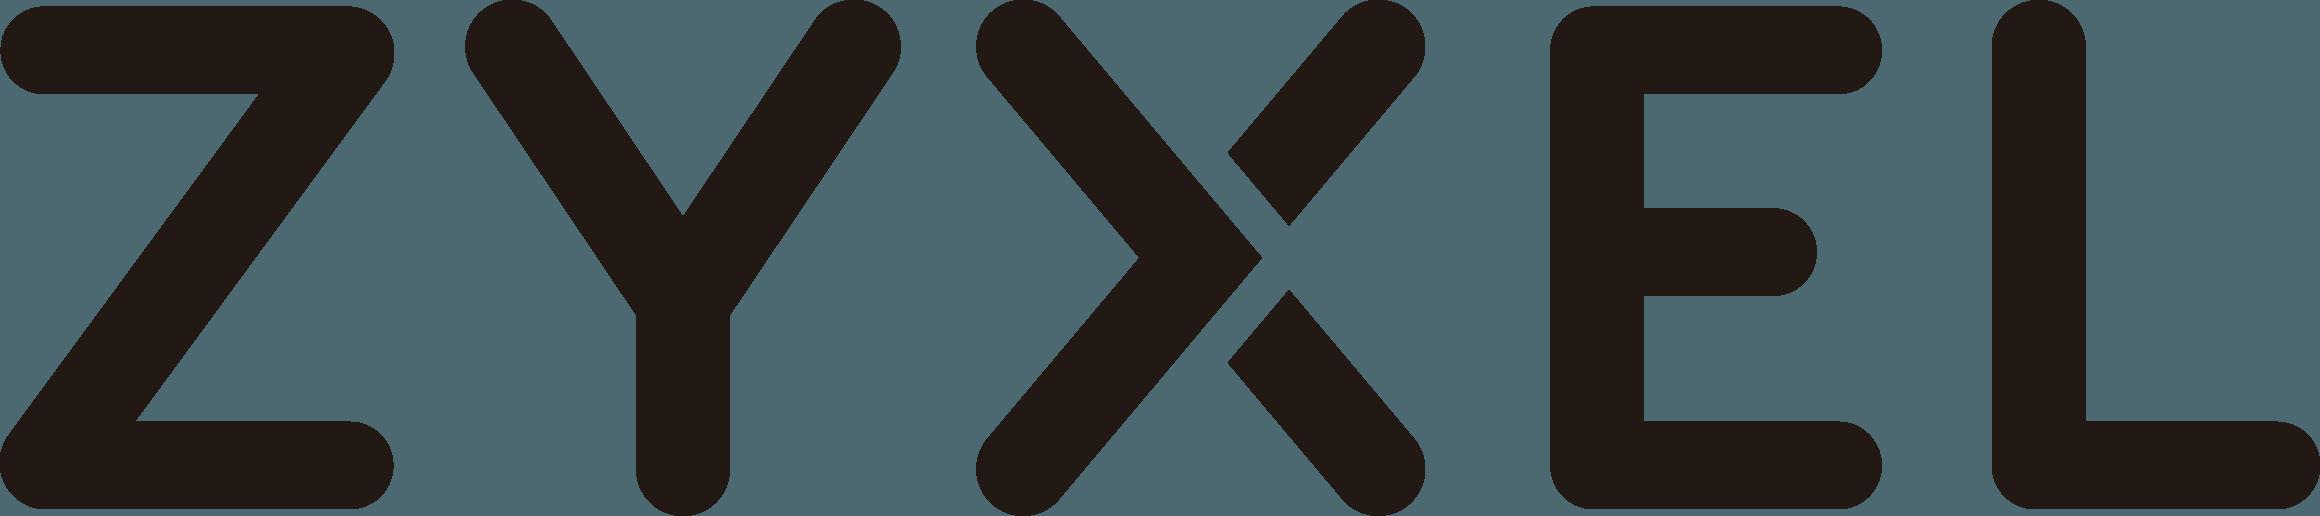 Zyxel Logo Download Vector.